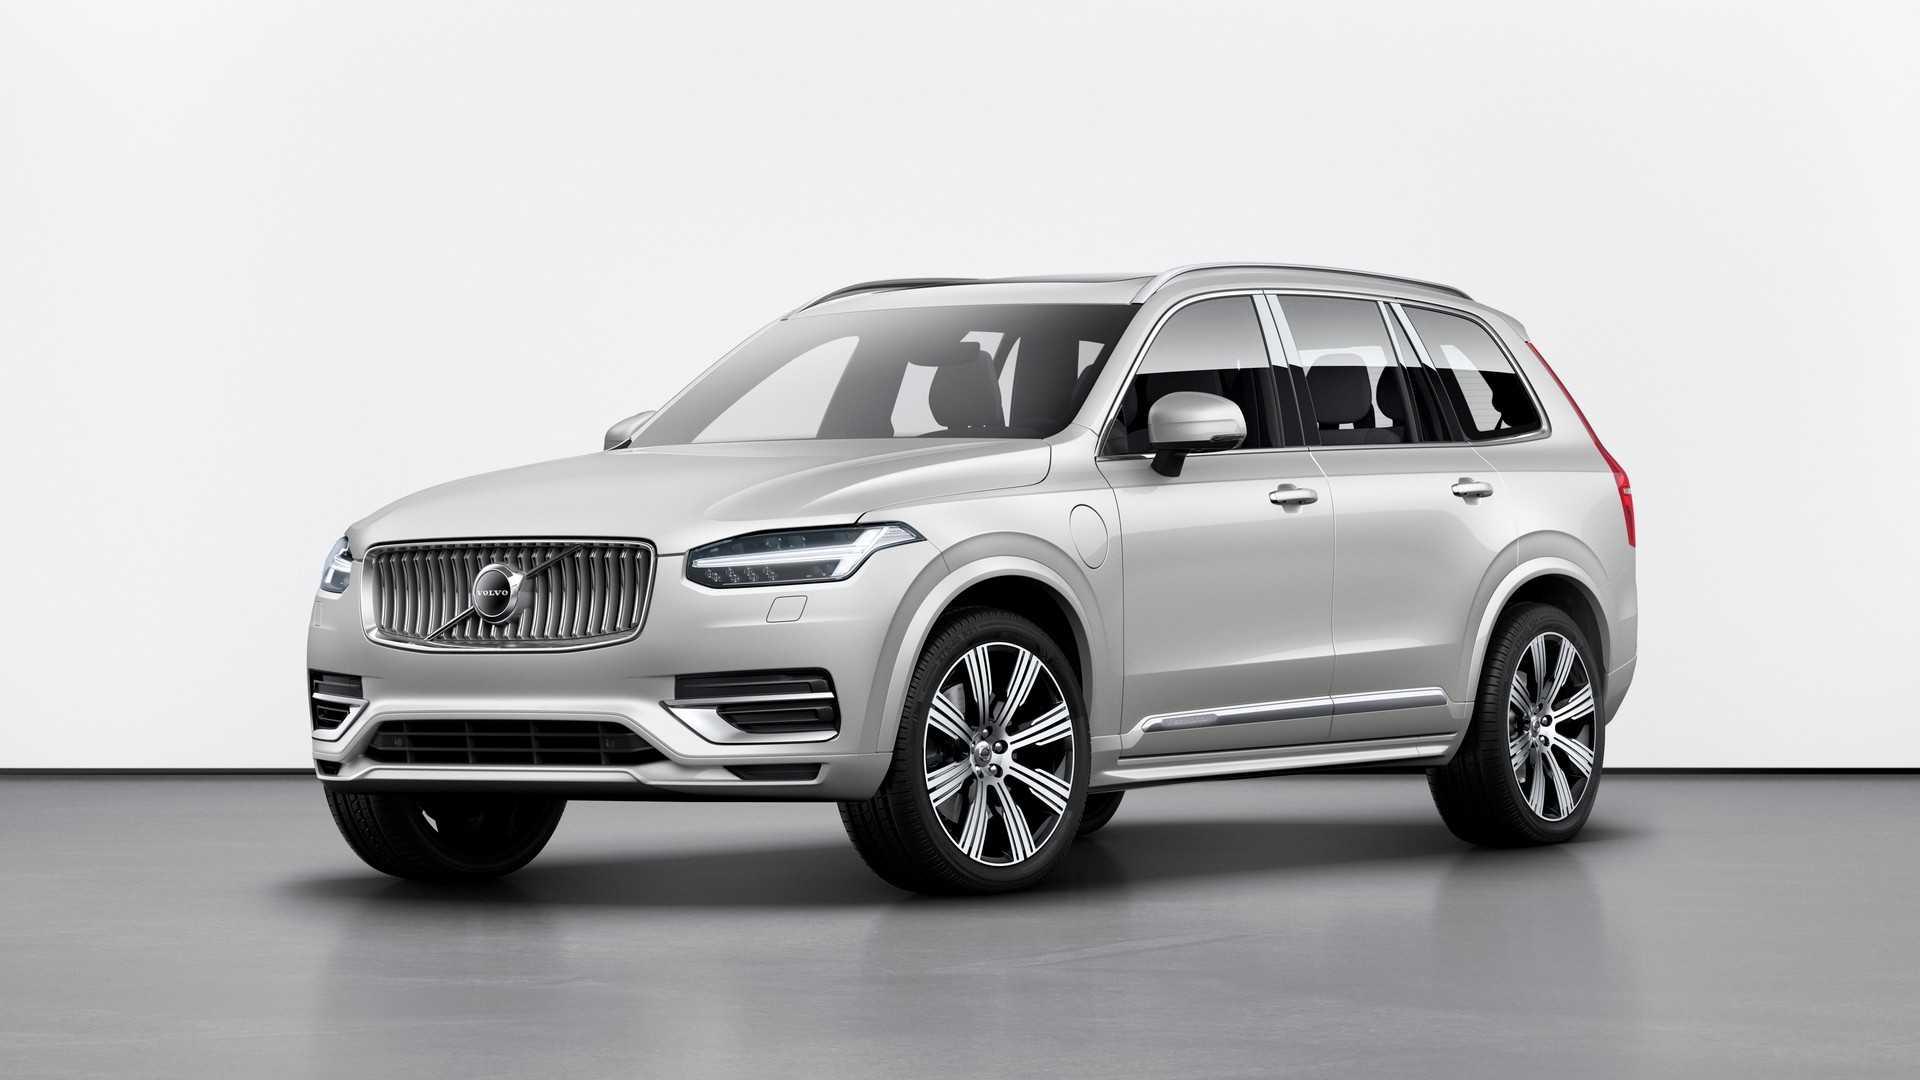 2022 Volvo XC90 new generation